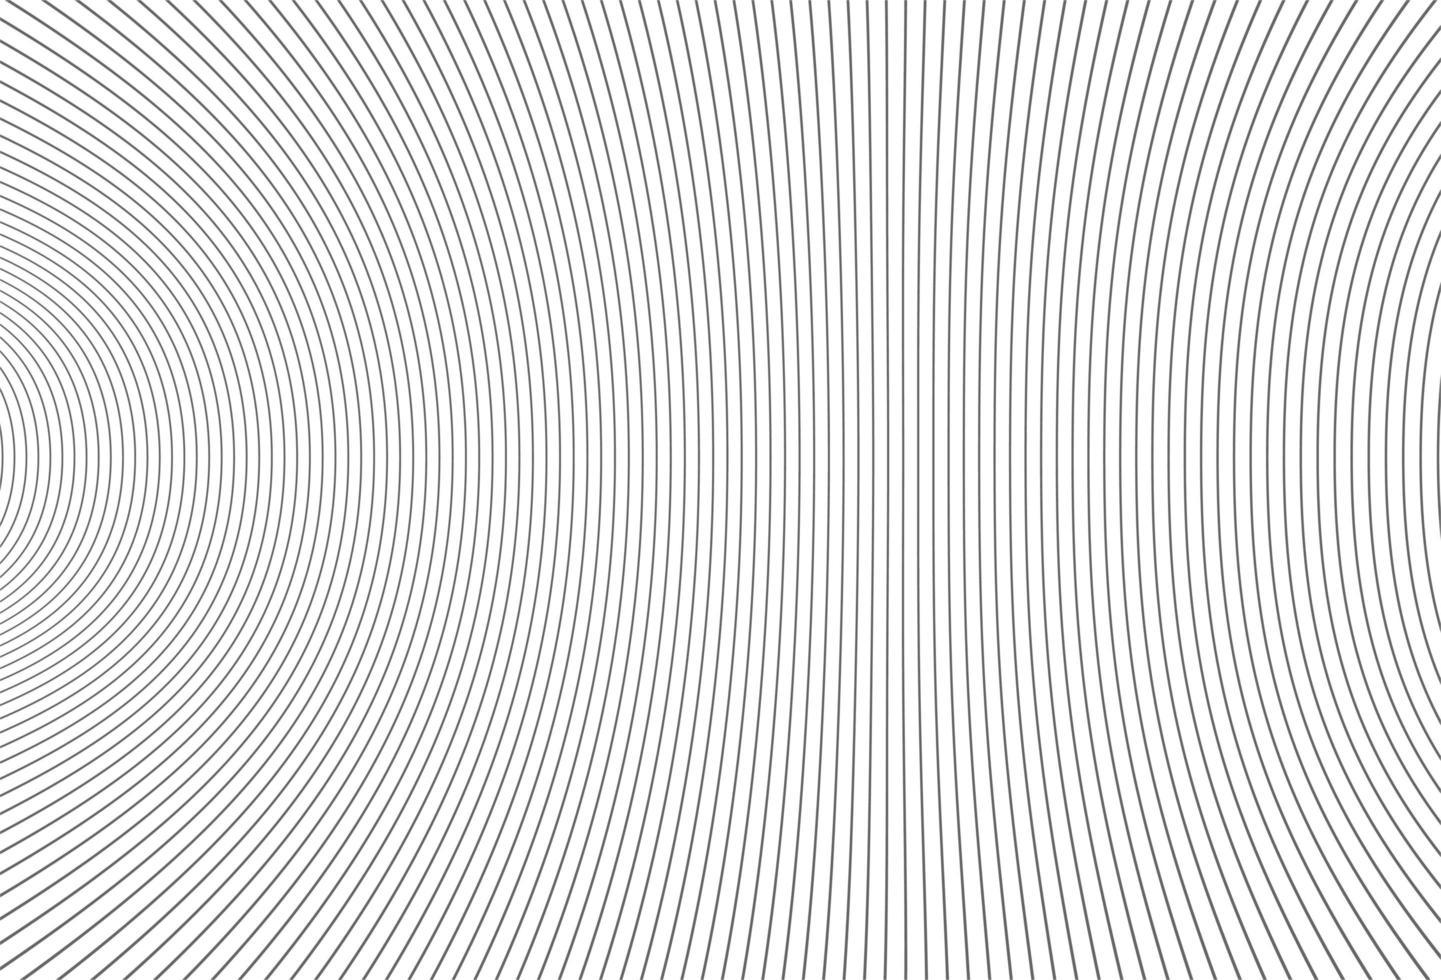 moderno grigio linee deformate sfondo vettore